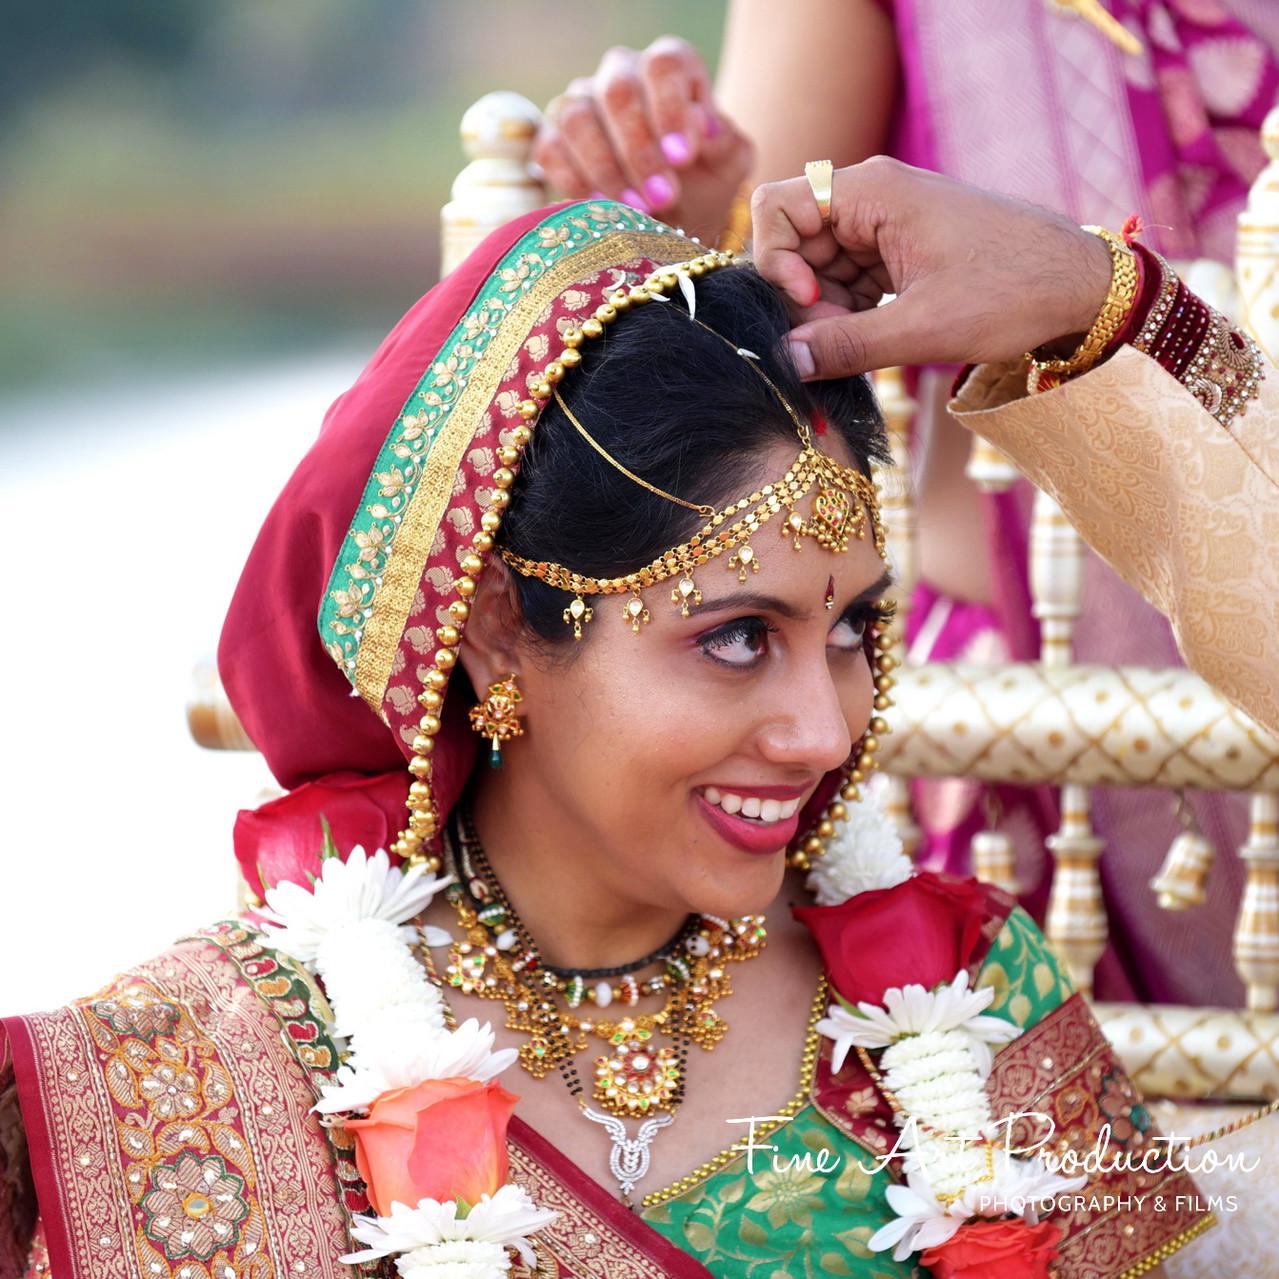 Hyatt-Regency-Grand-Cypress-Indian-Wedding-Photography-Fine-Art-Production-Amish-Thakkar_67